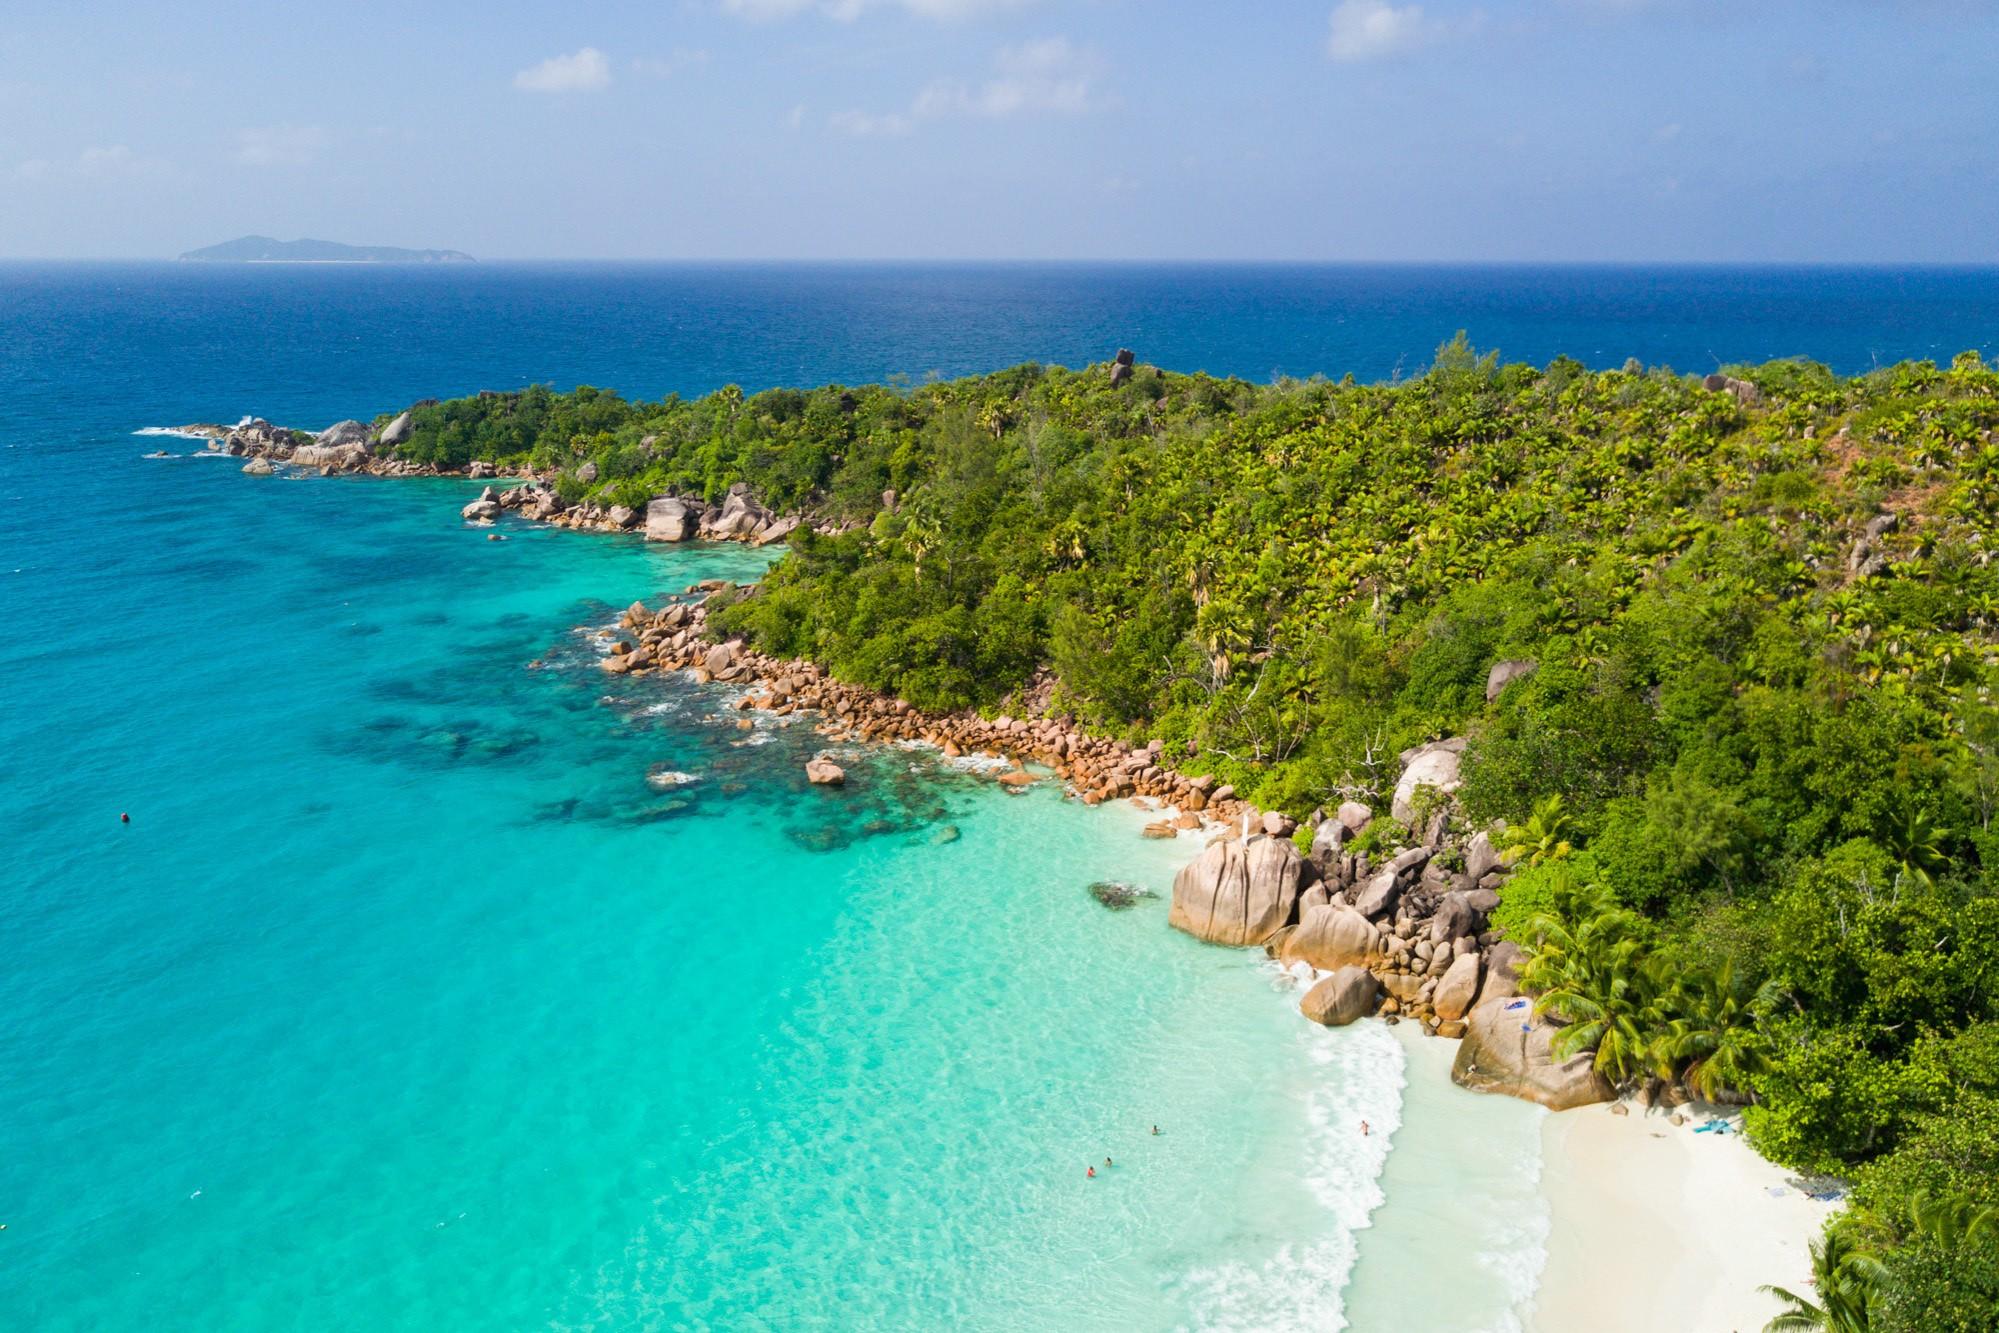 Praslin Island in the Seychelles